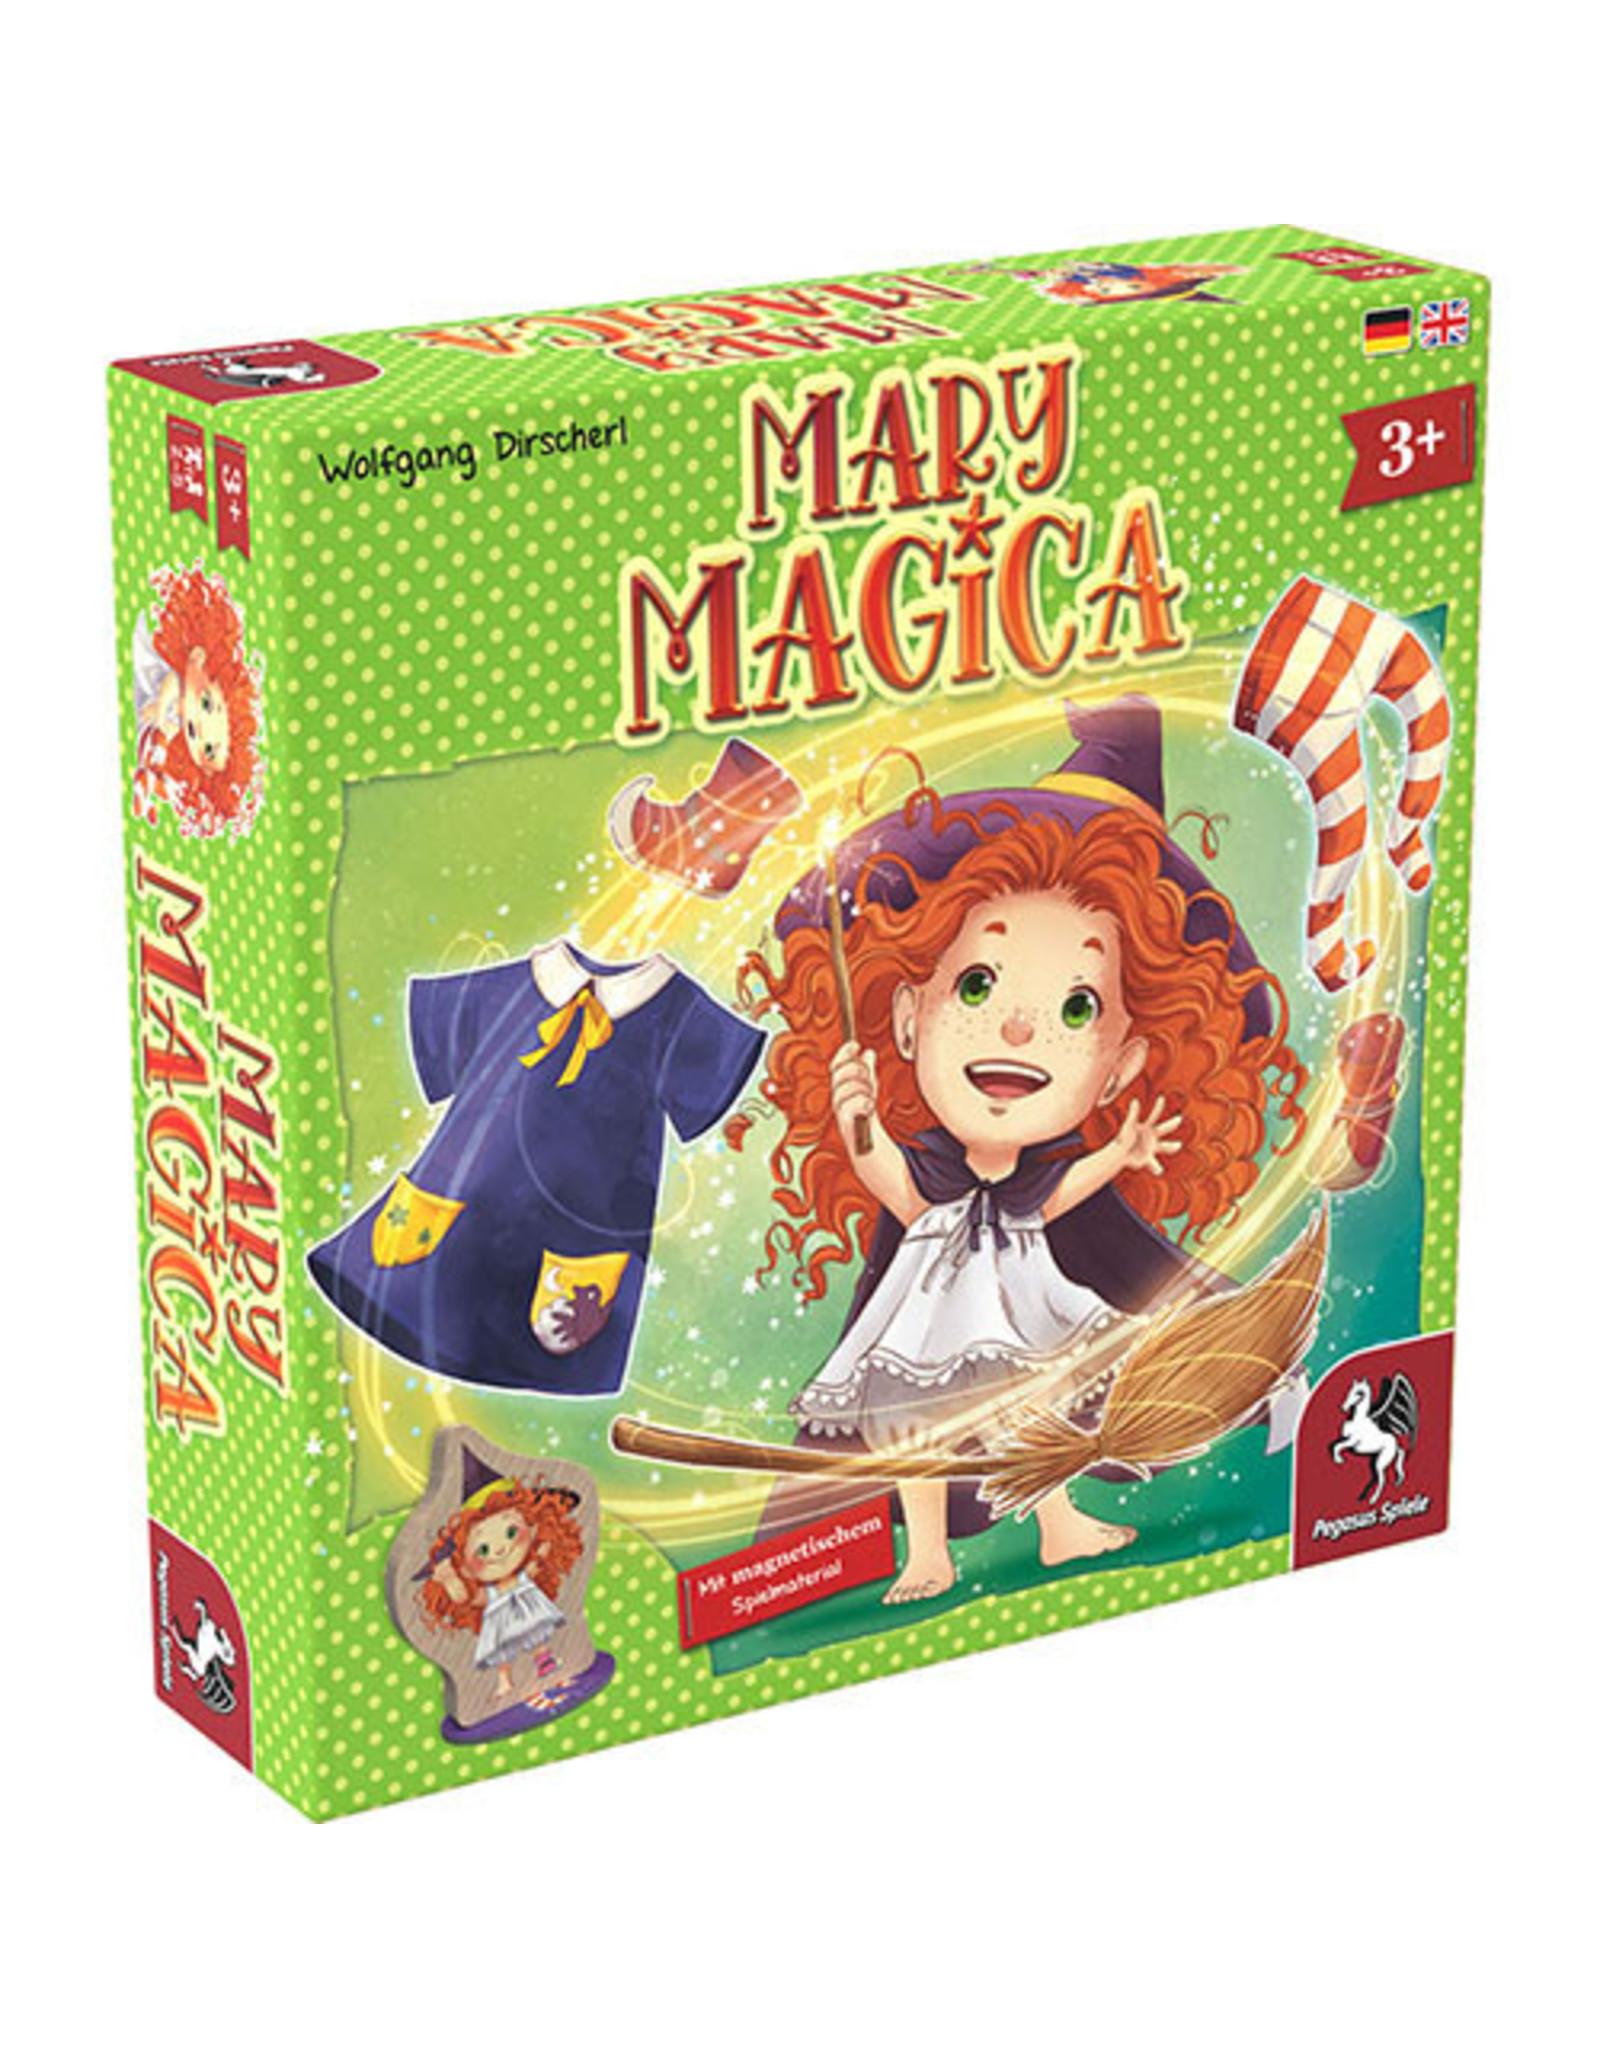 Mary Magica